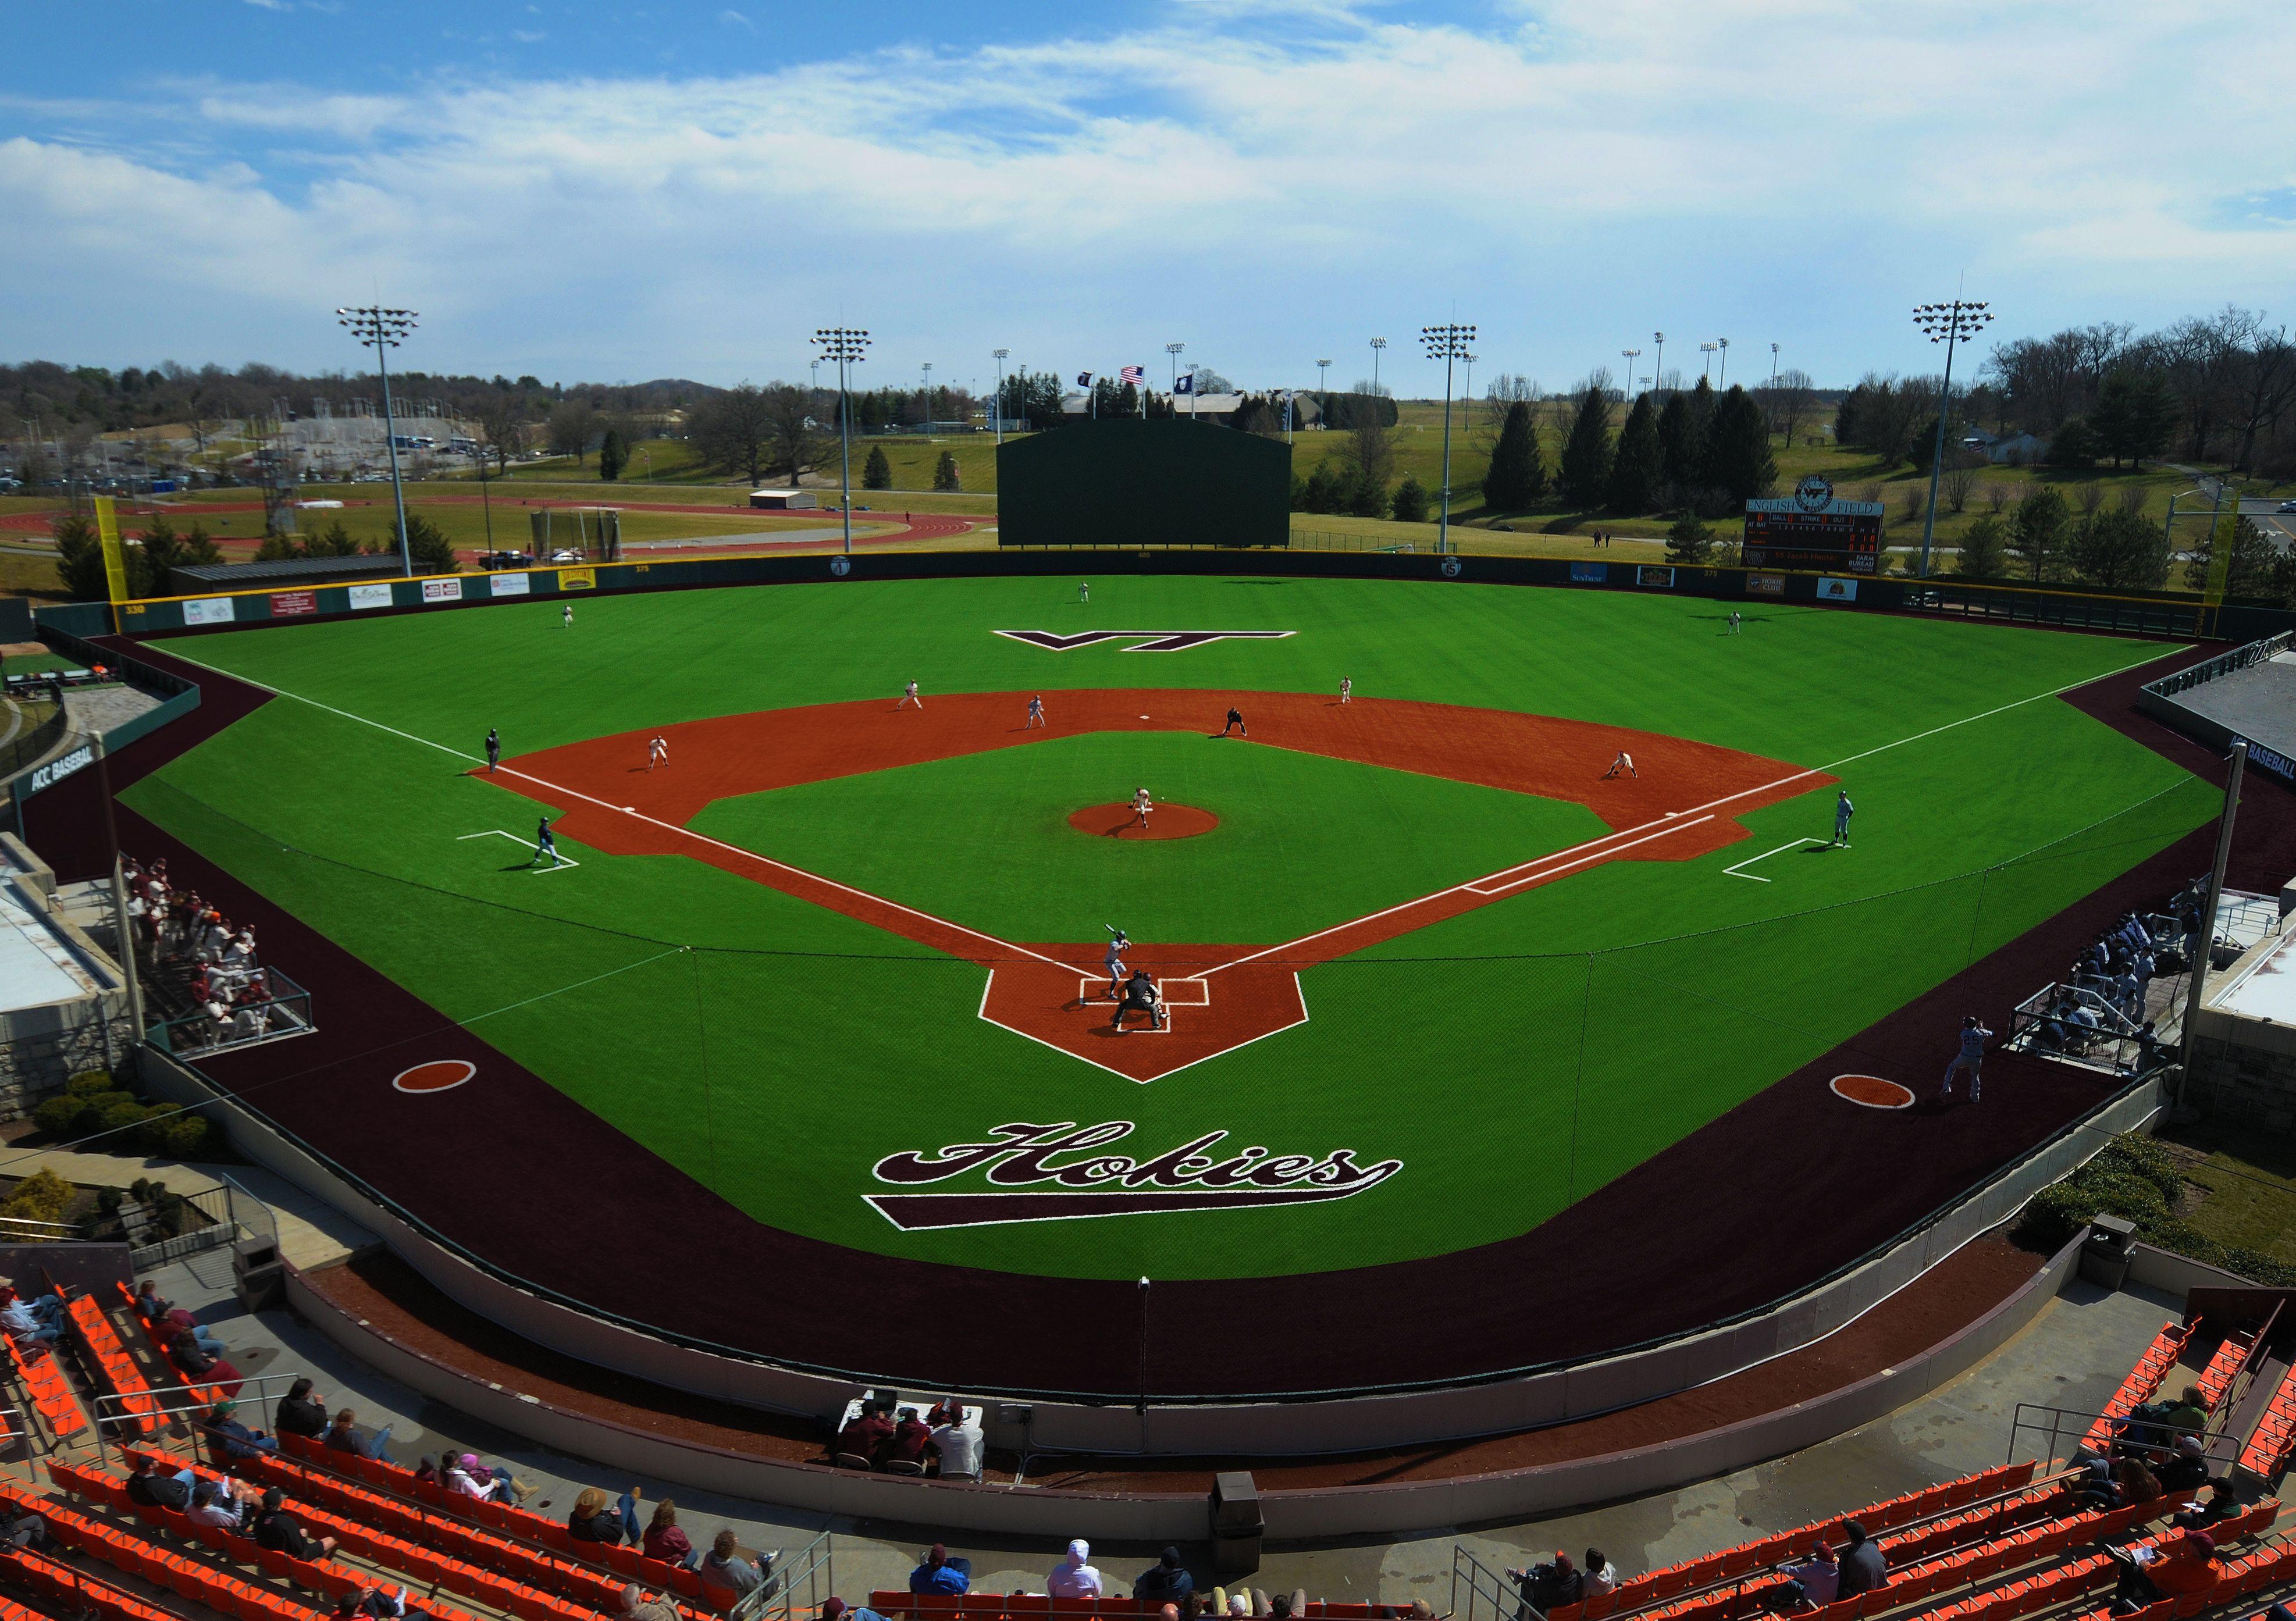 Virginia Tech English Field Astroturf Game Day Grass 3d 2012 Astro Turf Baseball Field Virginia Tech